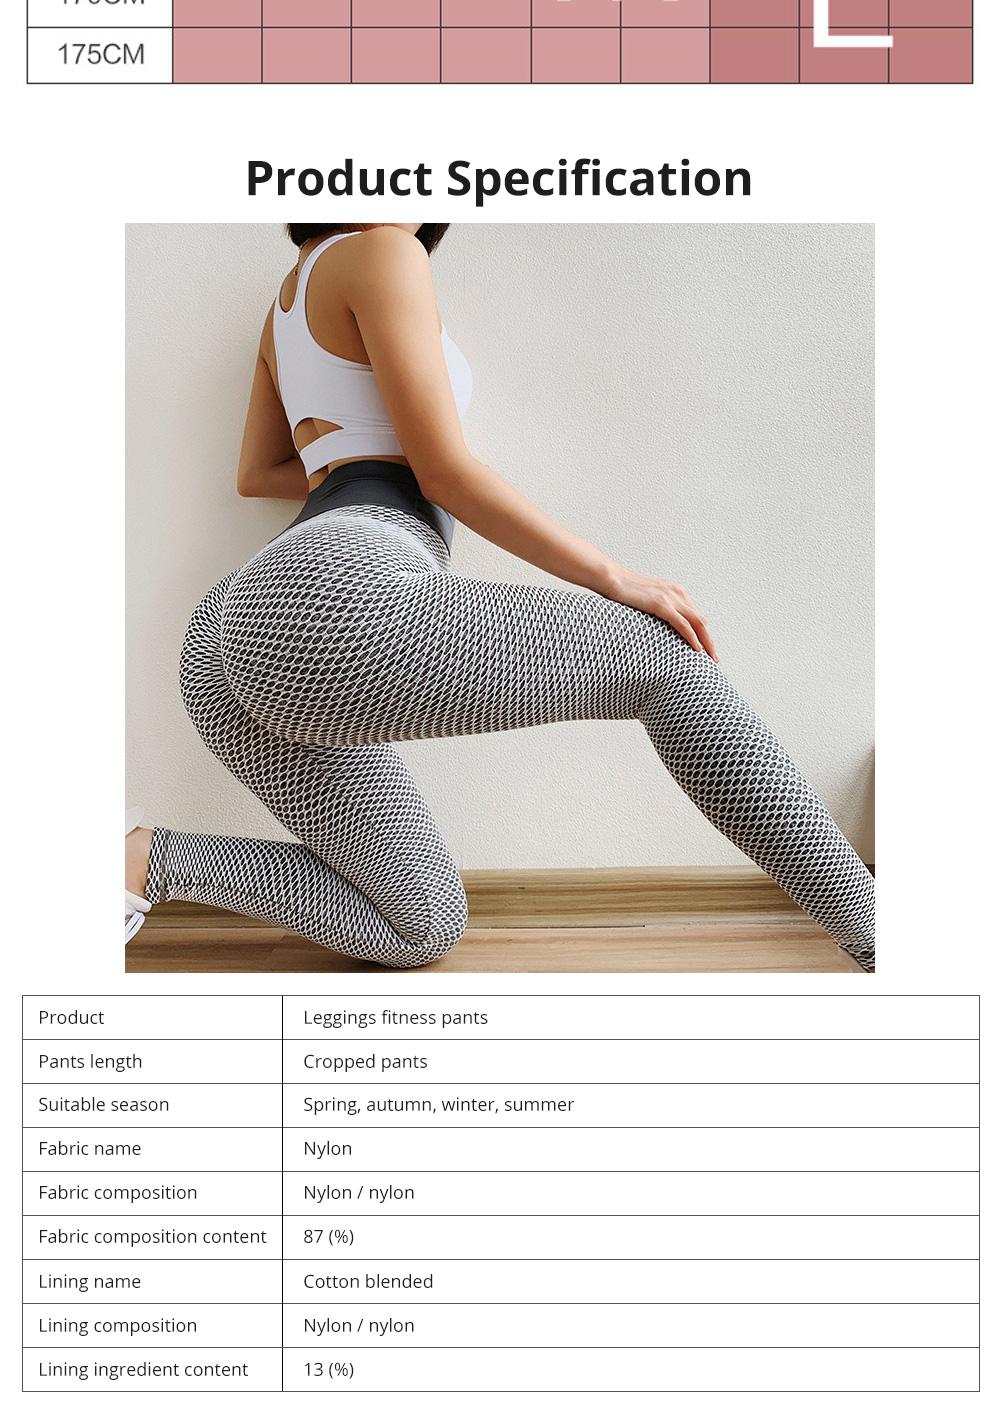 Women Wearing Tight Yoga Pants Fitness Seamless High Quality Workout Leggings High Waist Stretch Sports Yoga Pants 8